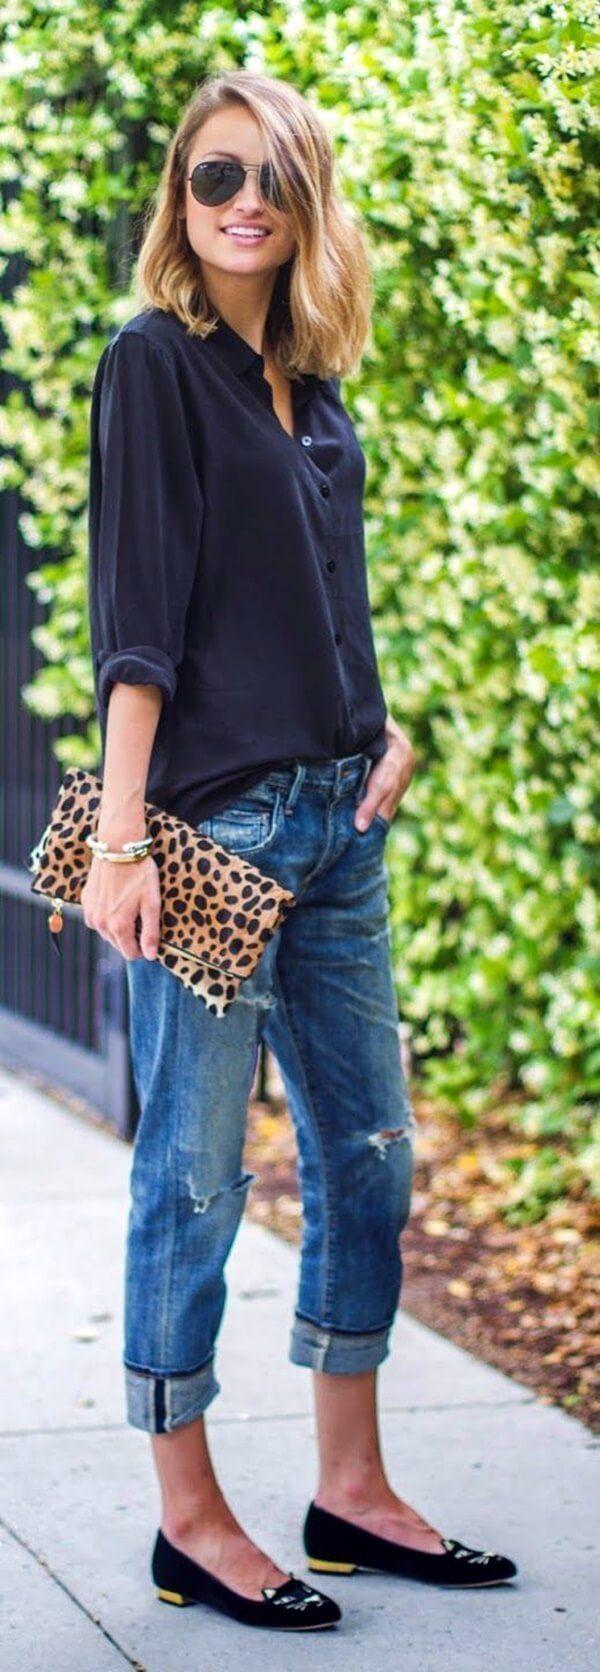 Desirable Fashion looks for short Women (14)